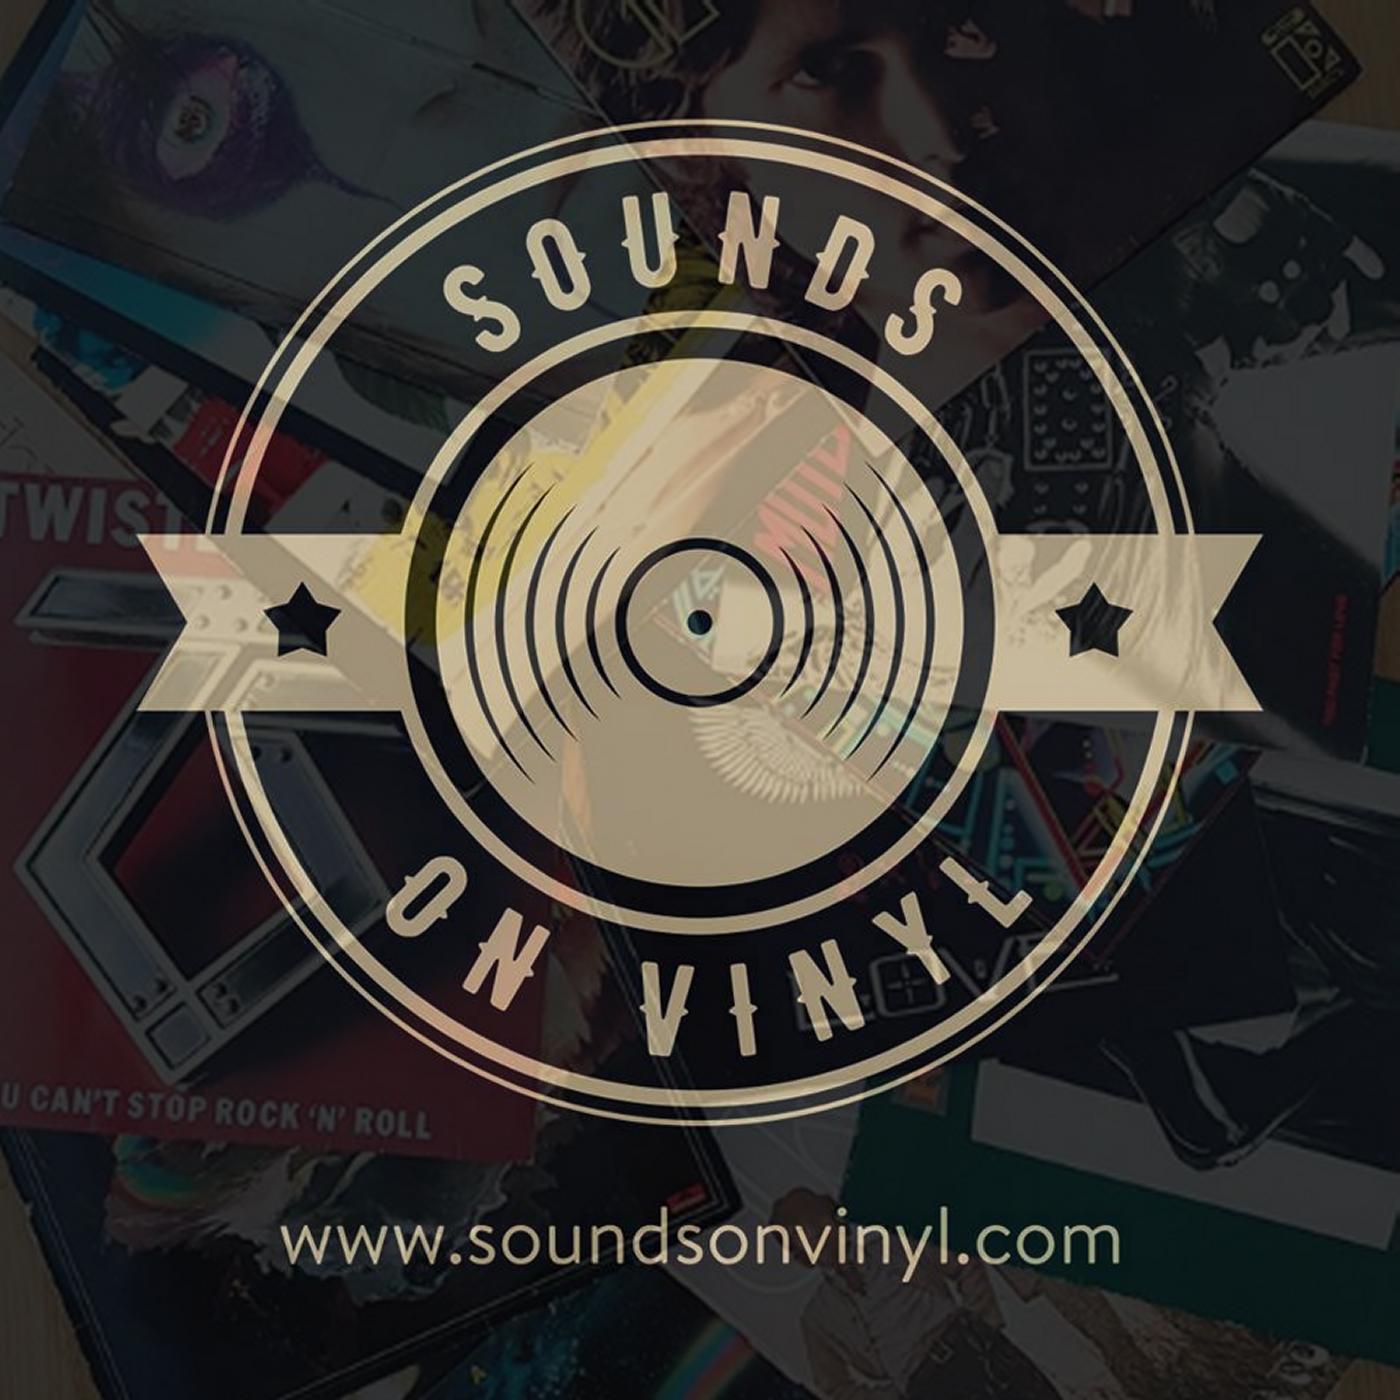 Artwork for podcast Sounds On Vinyl